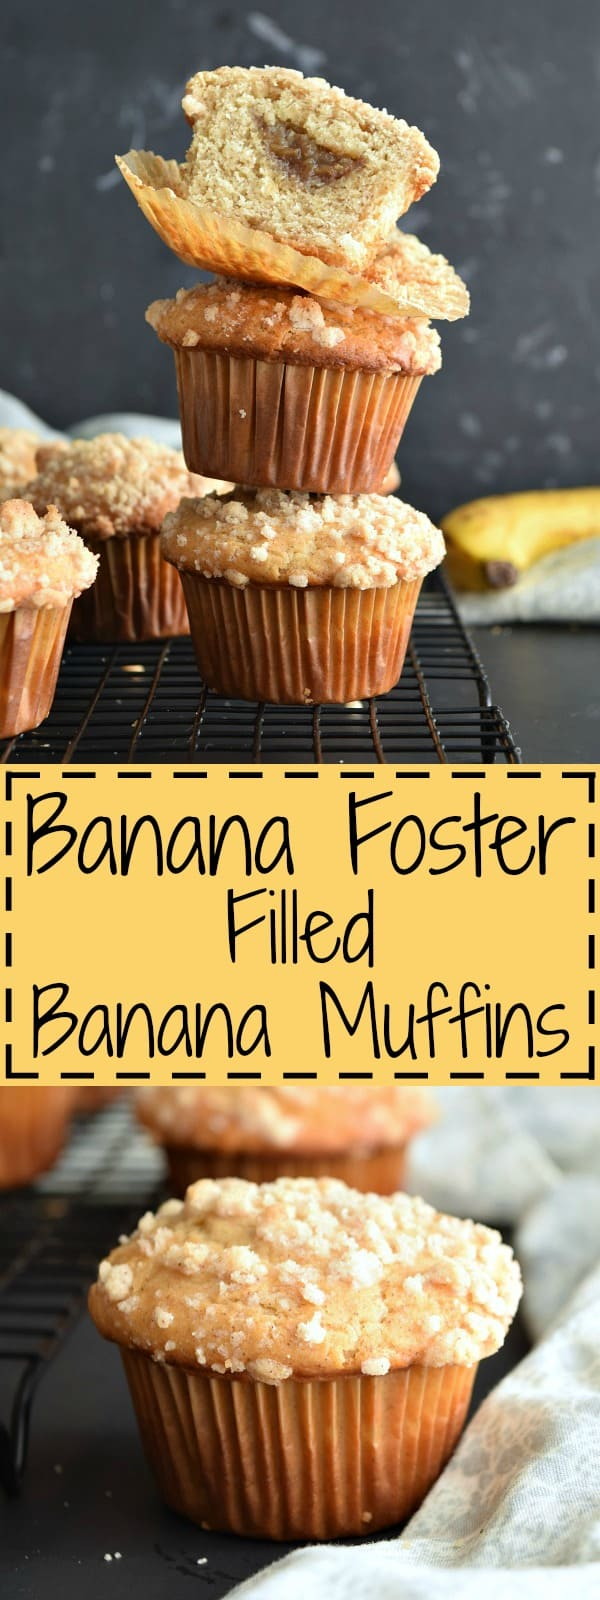 Banana Foster Filled Banana Muffins